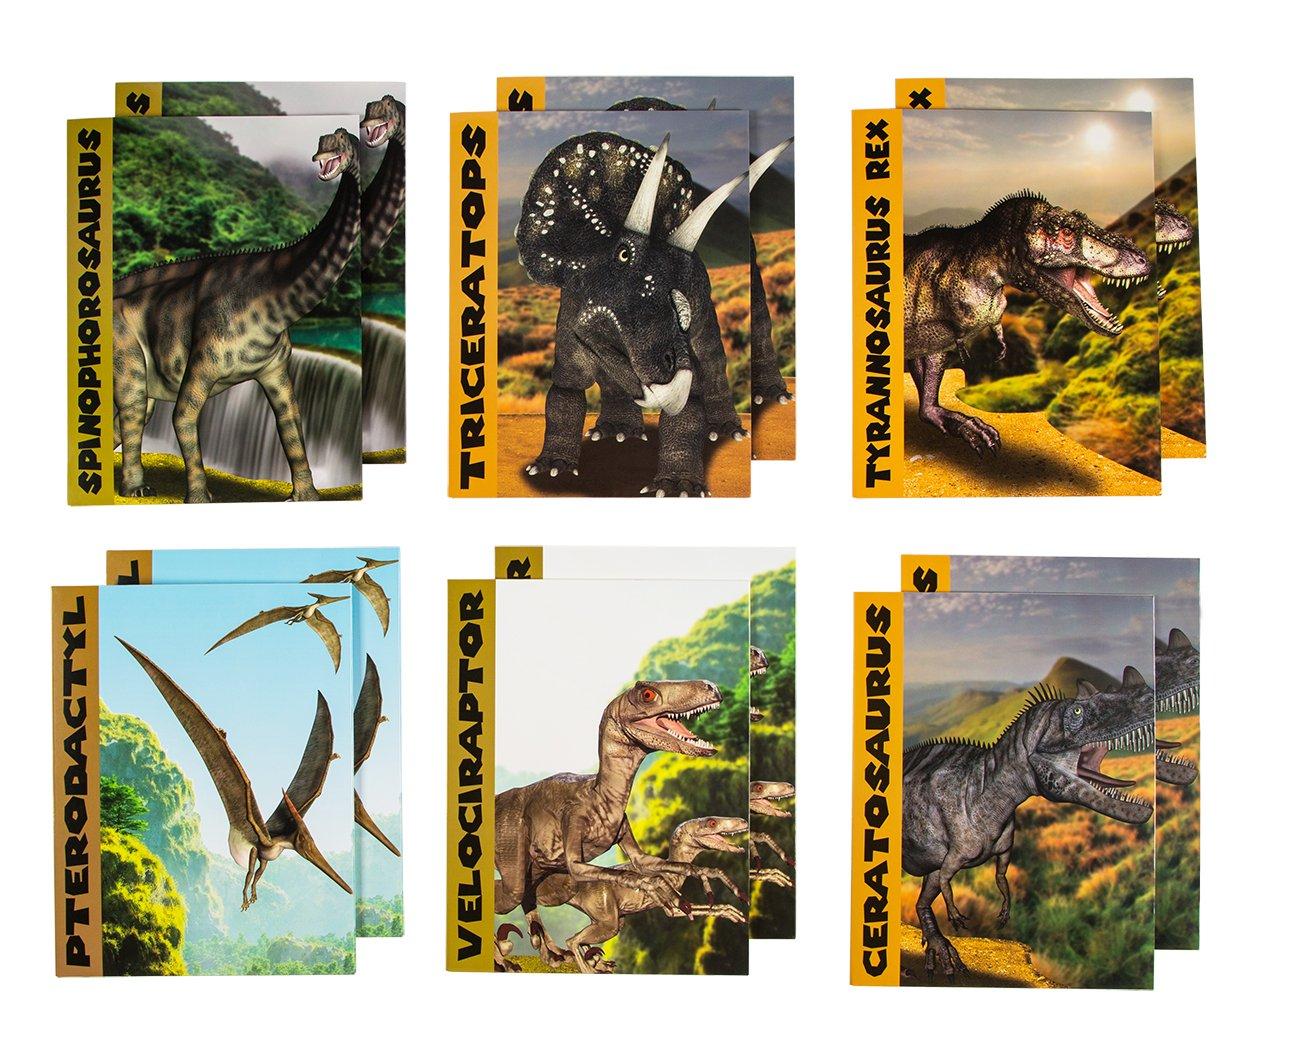 Two Pocket Folders Bulk – 12-Pack Letter Size File Folders, 6 Dinosaur Designs, School Folders with Pockets, 12 x 9.2 Inches